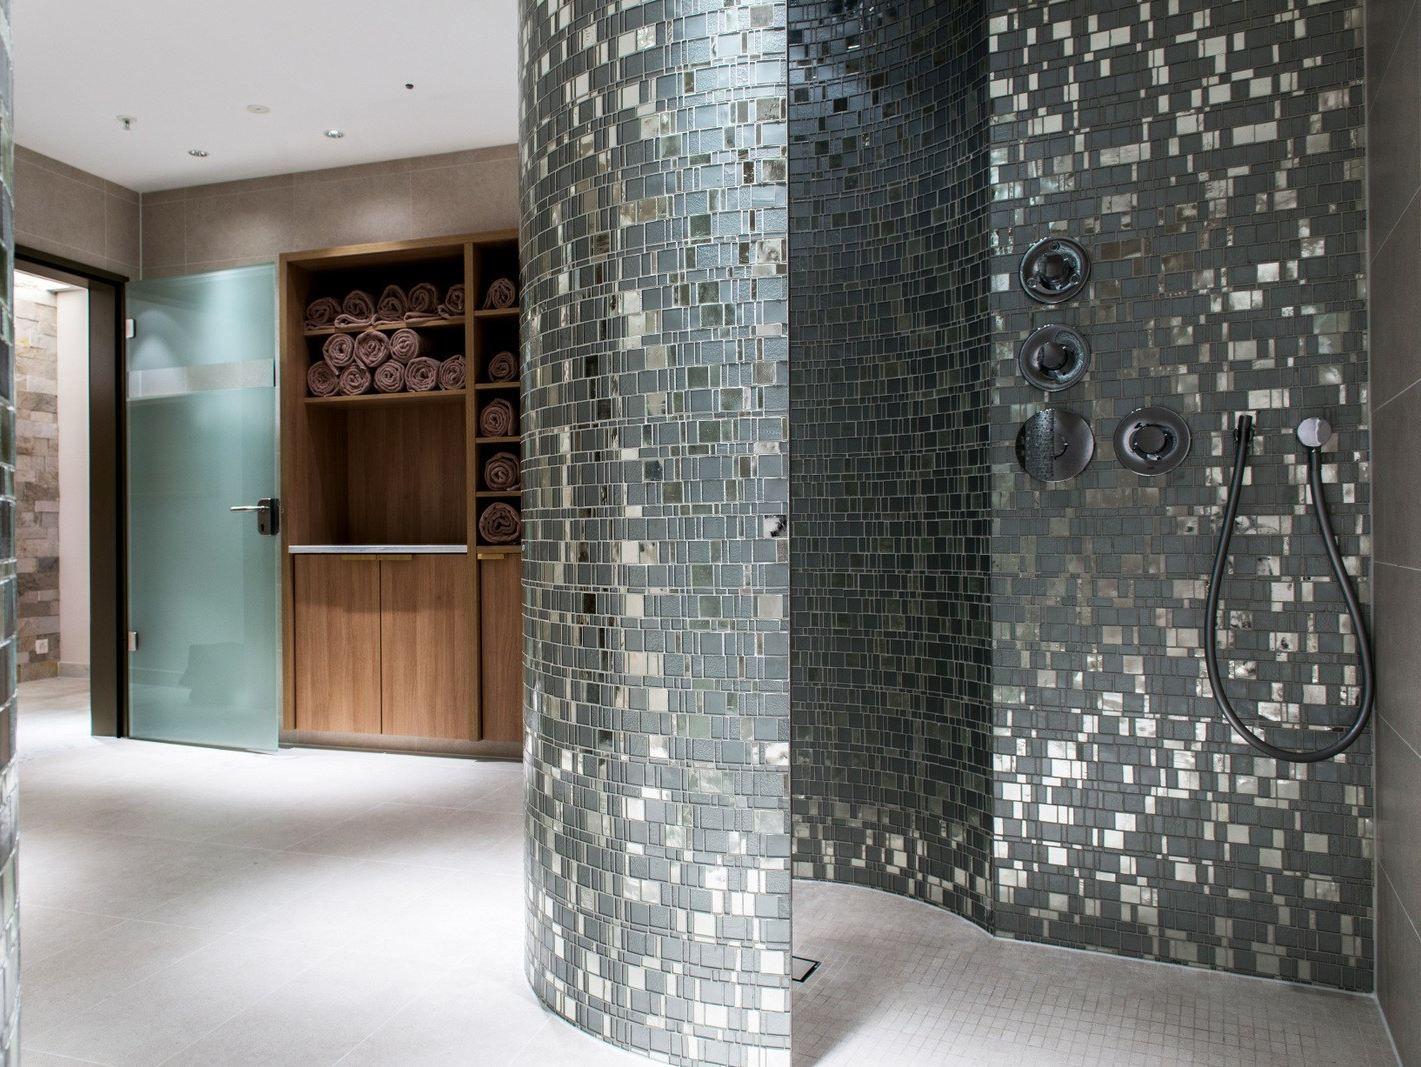 Mosaico in vetro liberty by trend group for Mosaico bisazza prezzi